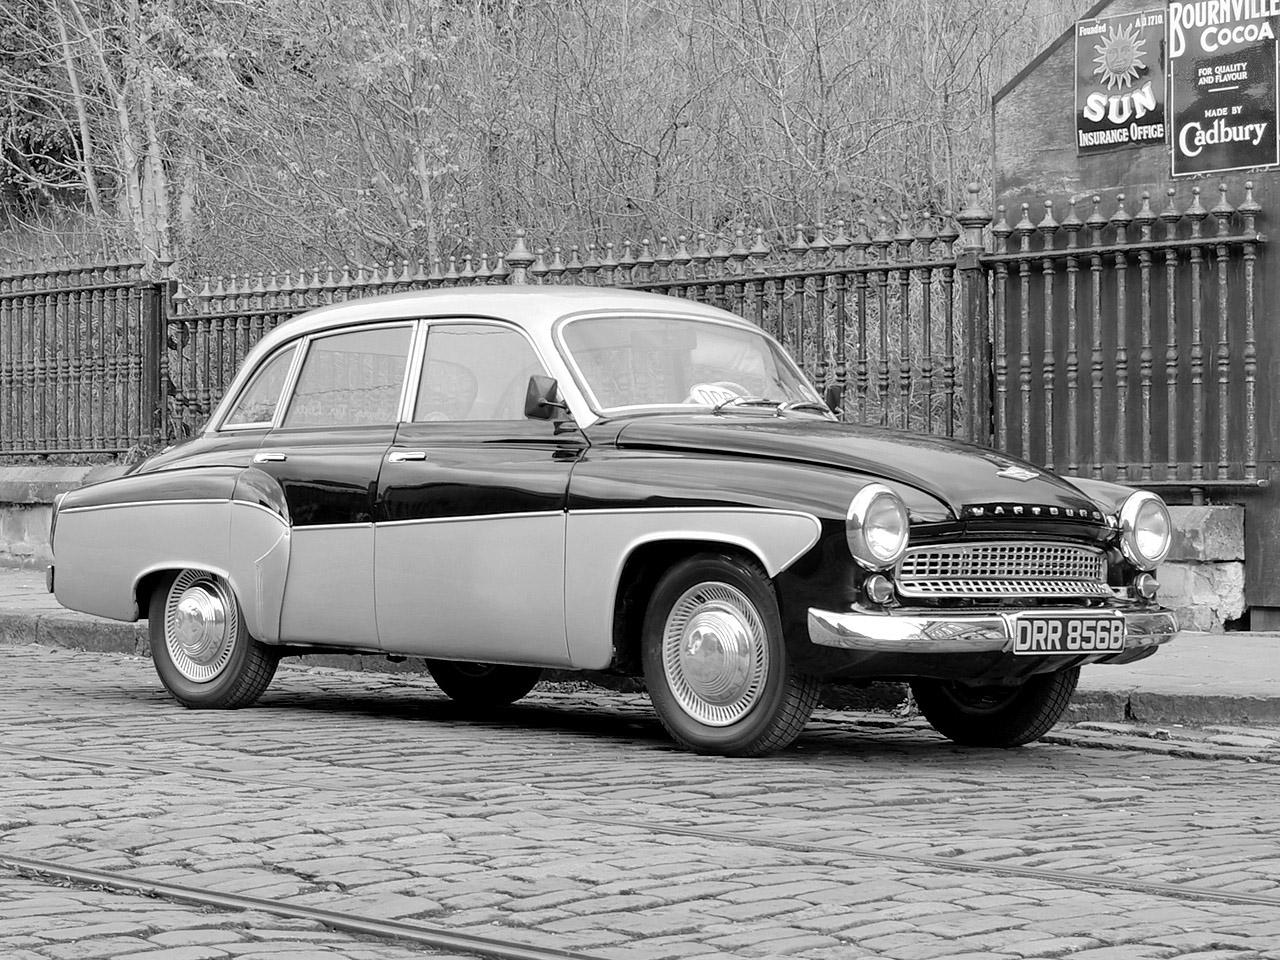 wartburg_311-1956-66_r6_jpg.jpg